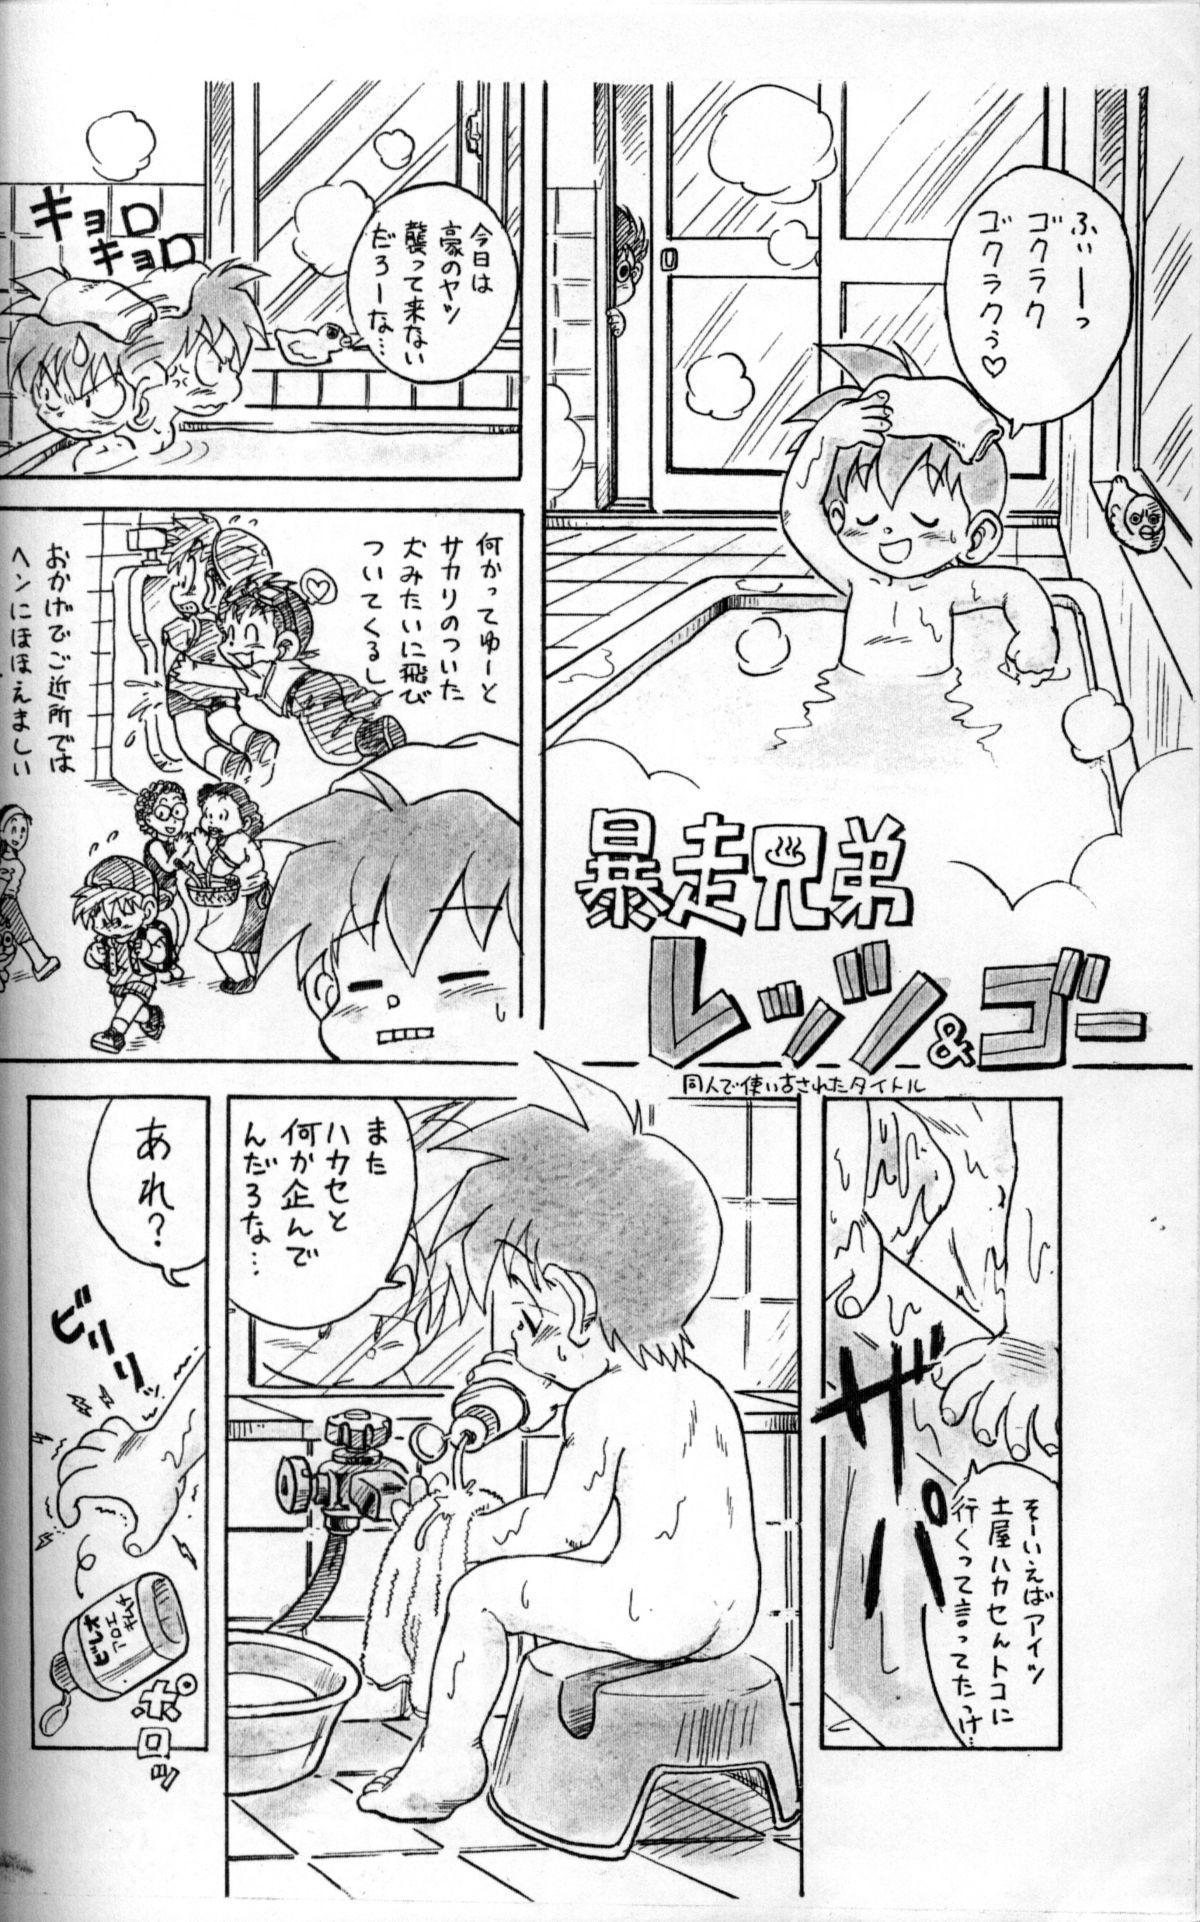 Mitsui Jun - Dreamer's Only - Anime Shota Character Mix 14